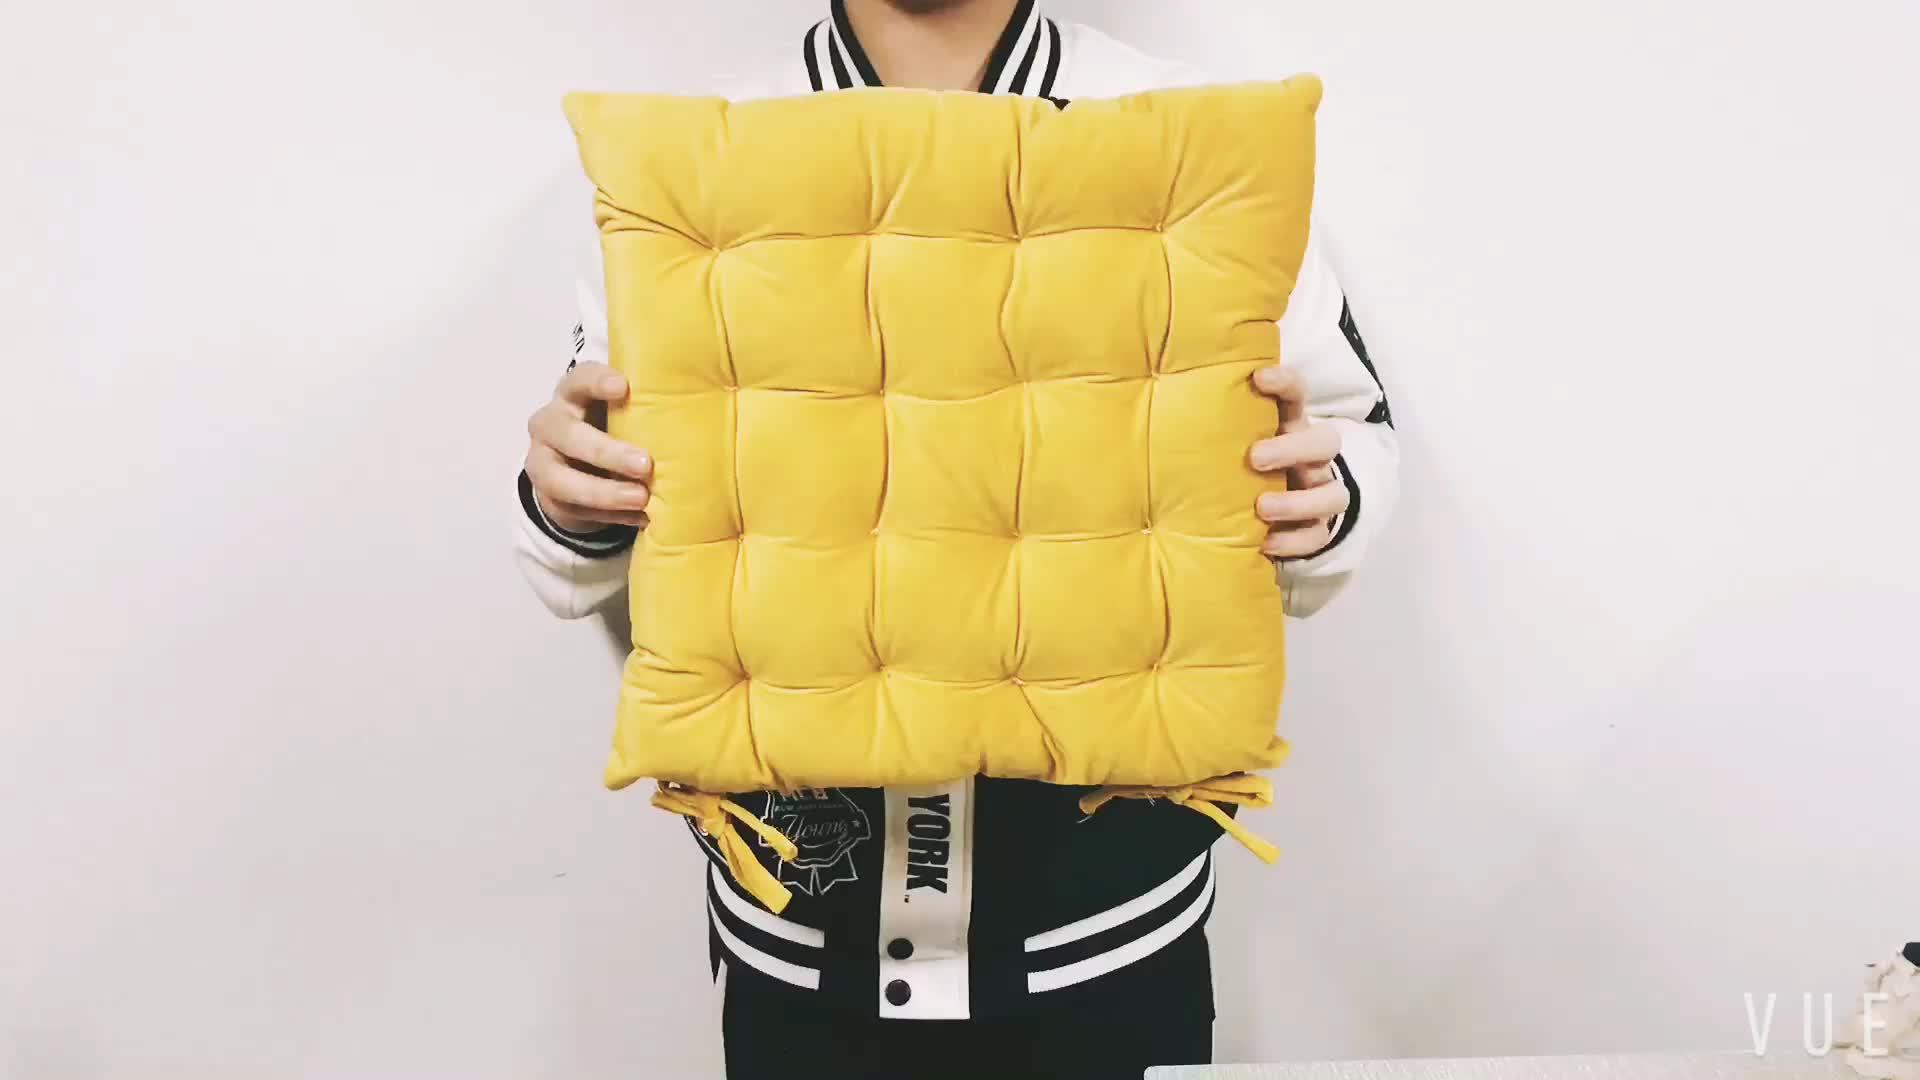 Free sample low MOQ custom chinese chair sofa meditation seat+cushions car seat cushion for home decor